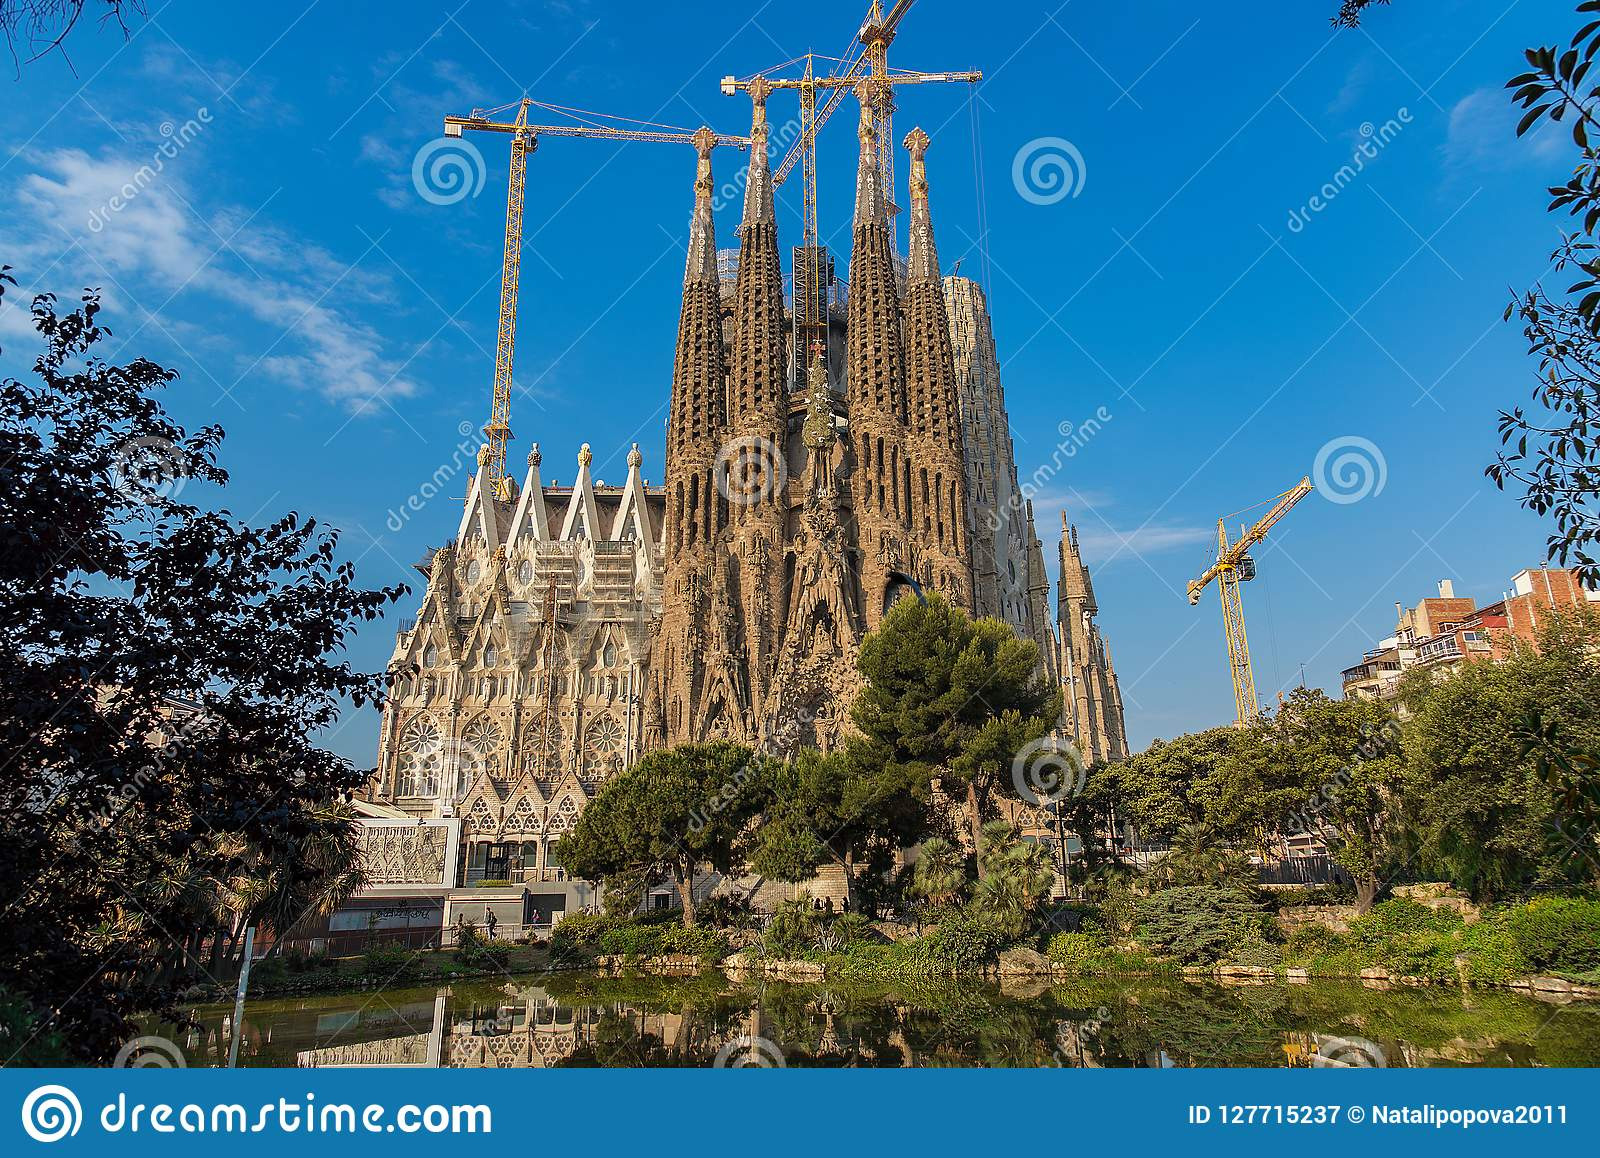 The Cathedral of La Sagrada Familia by the architect Antonio Gaudi, Catalonia, Barcelona Spain - May 17, 2018.